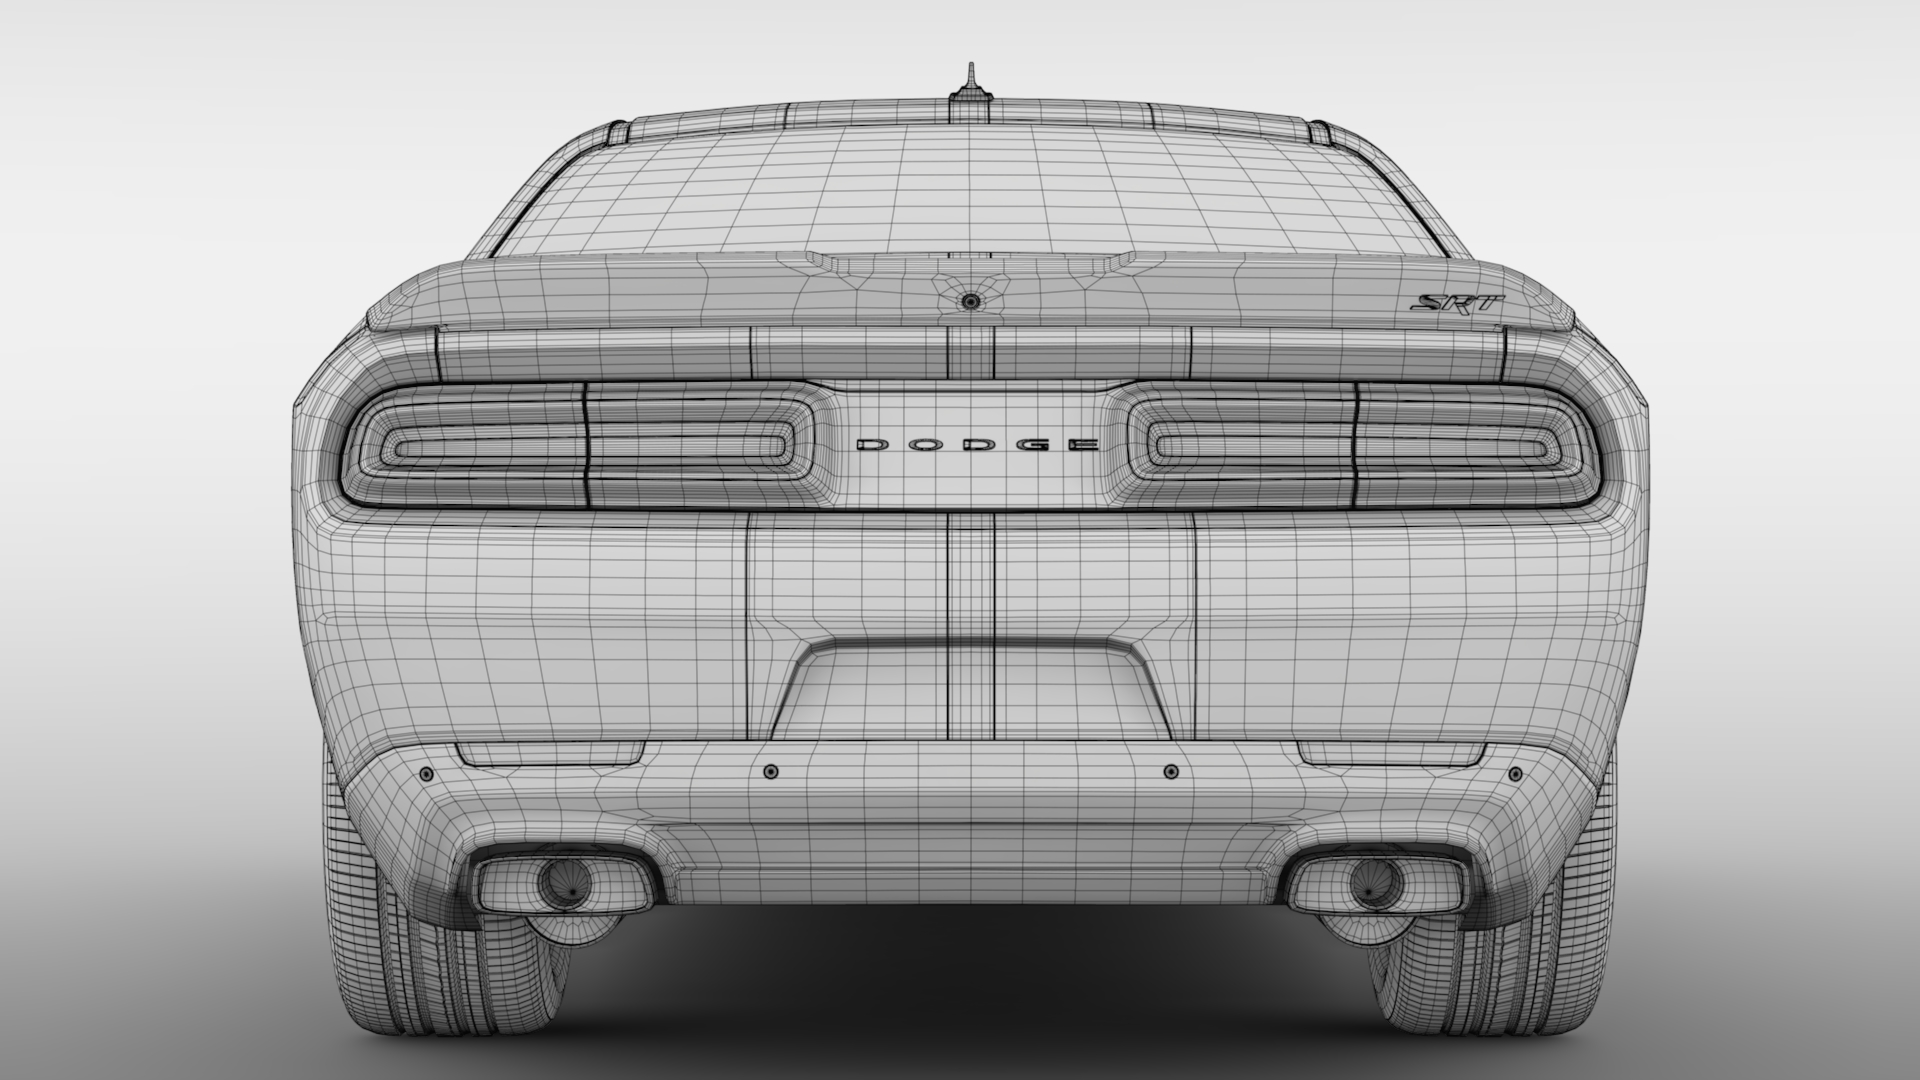 Dodge Challenger Srt Hellcat Go Mangoo 2017 By Creator 3d